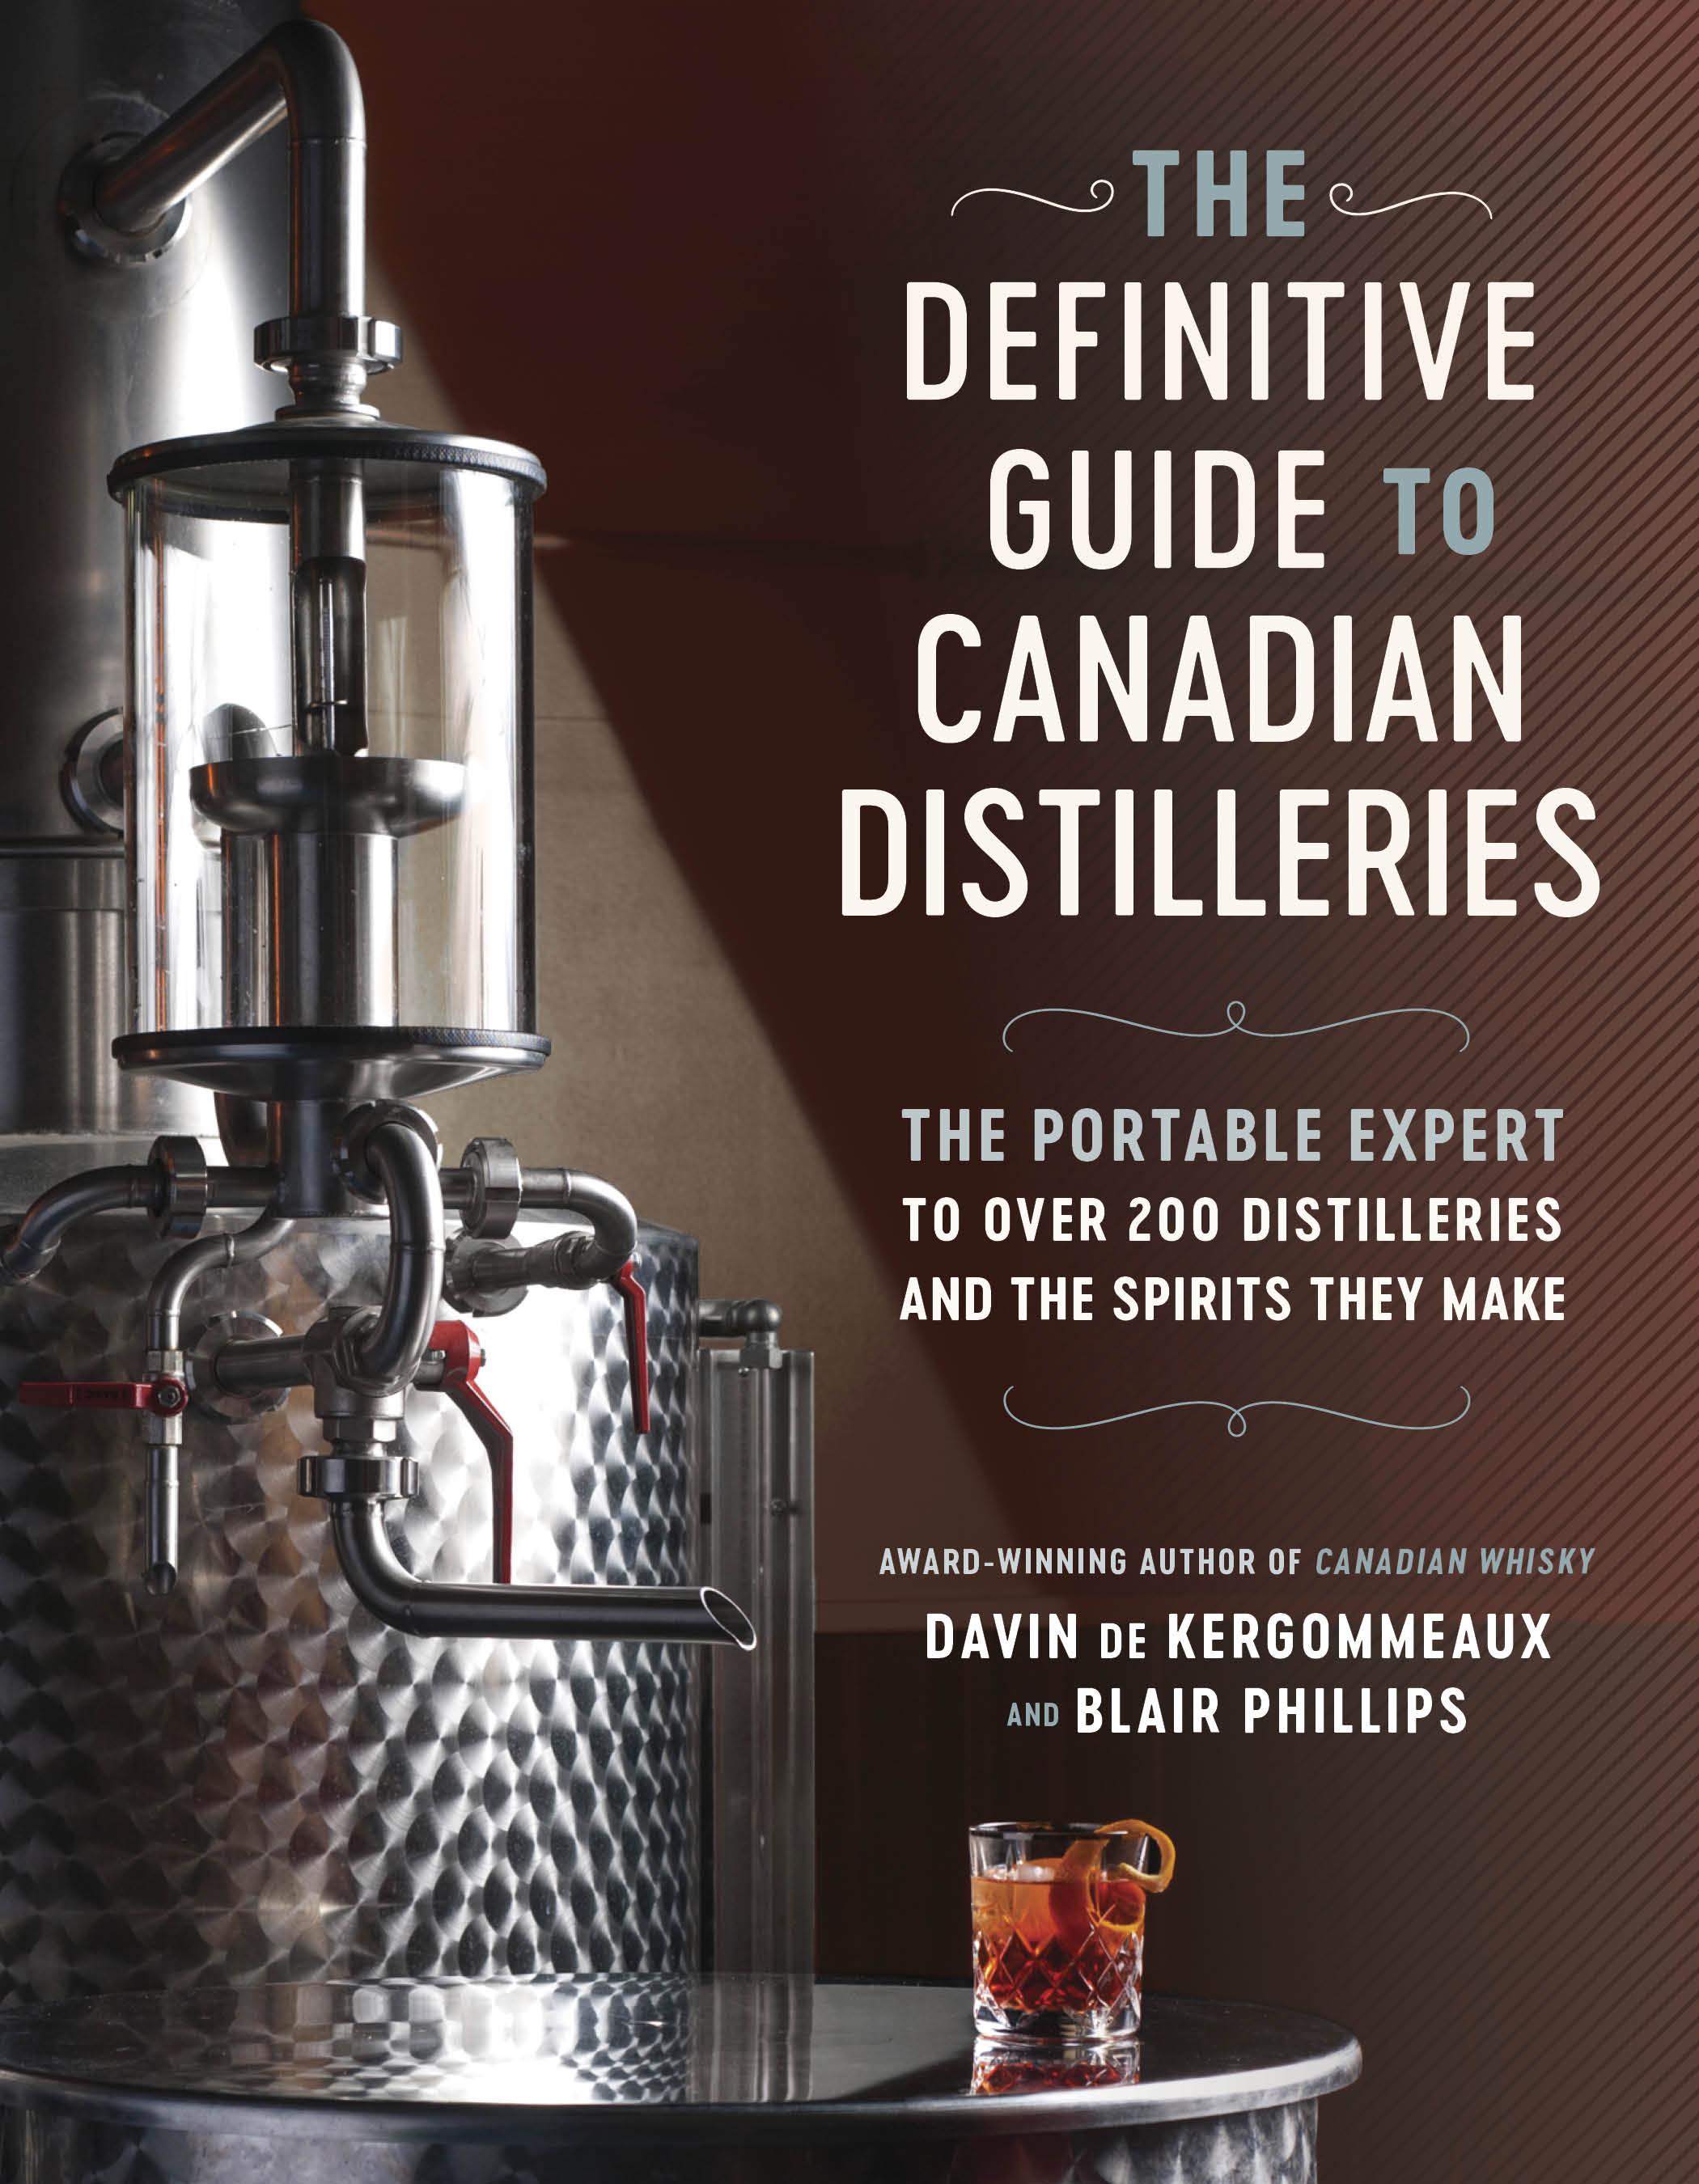 1 Canadian Distilleries book cover.jpg